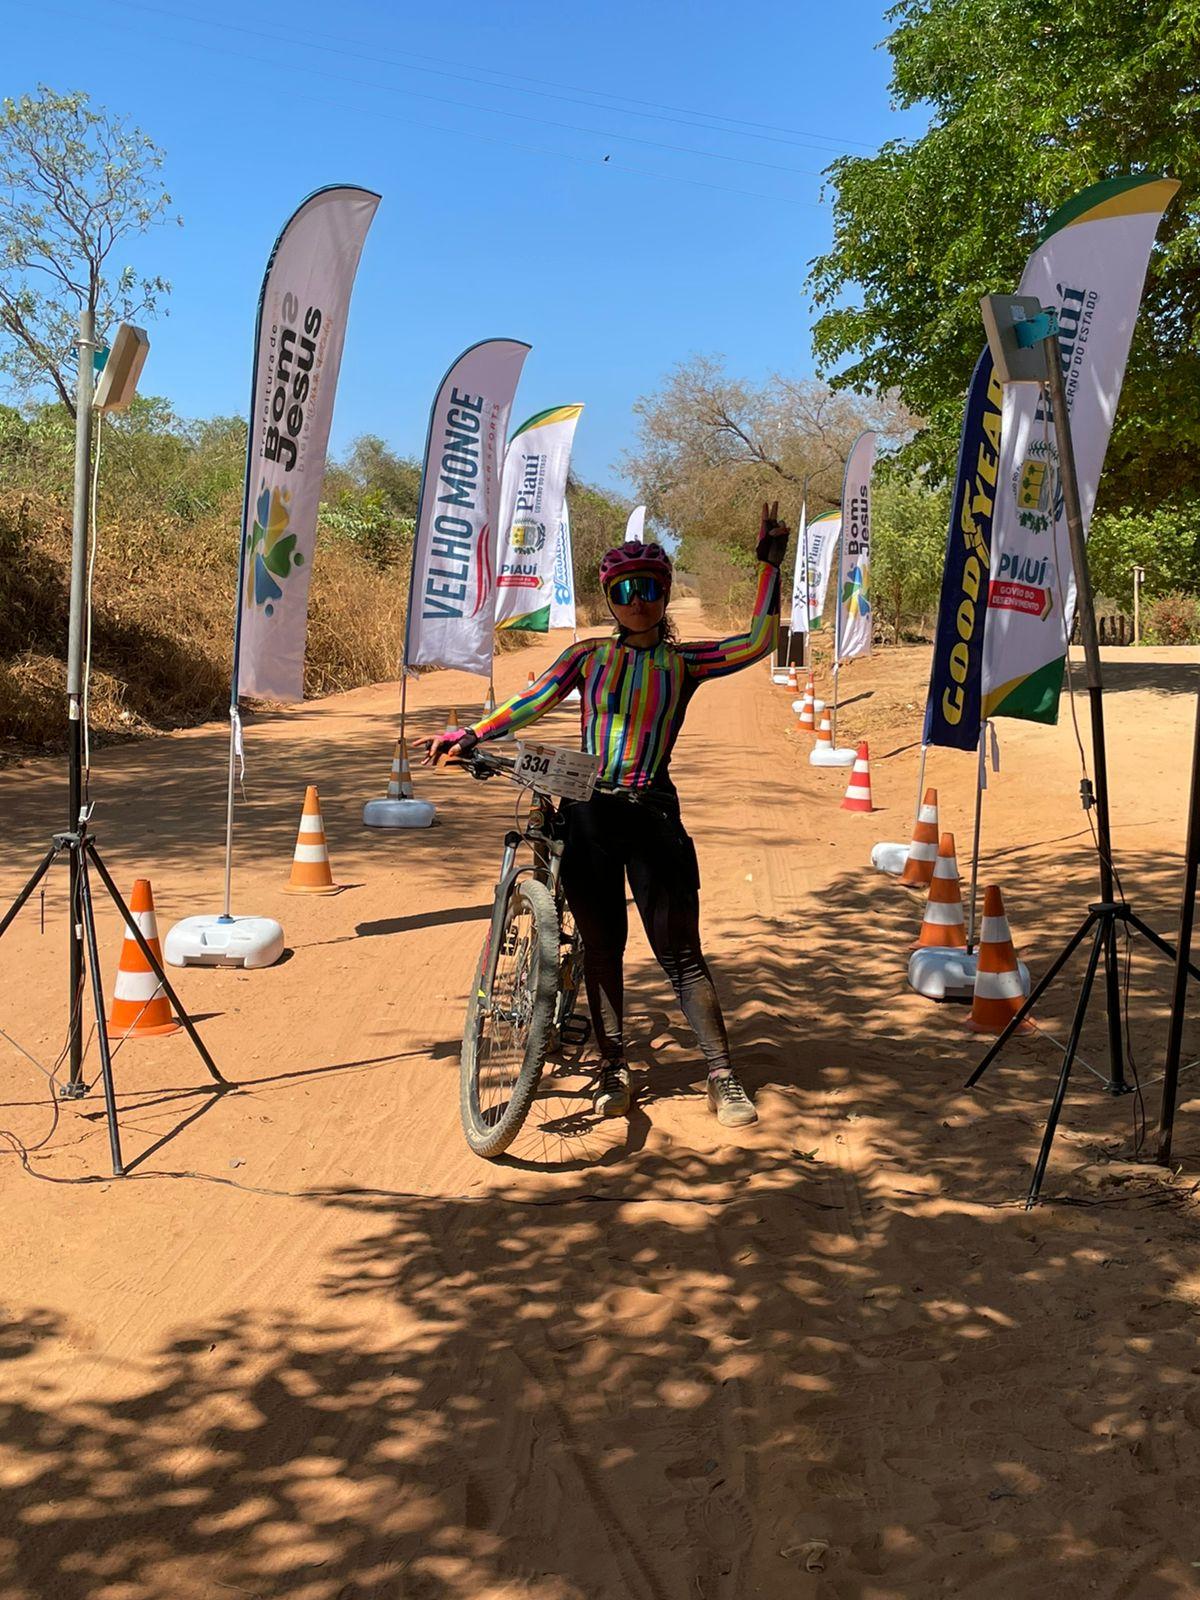 Competidora na bike (Andressa Sipaúba)